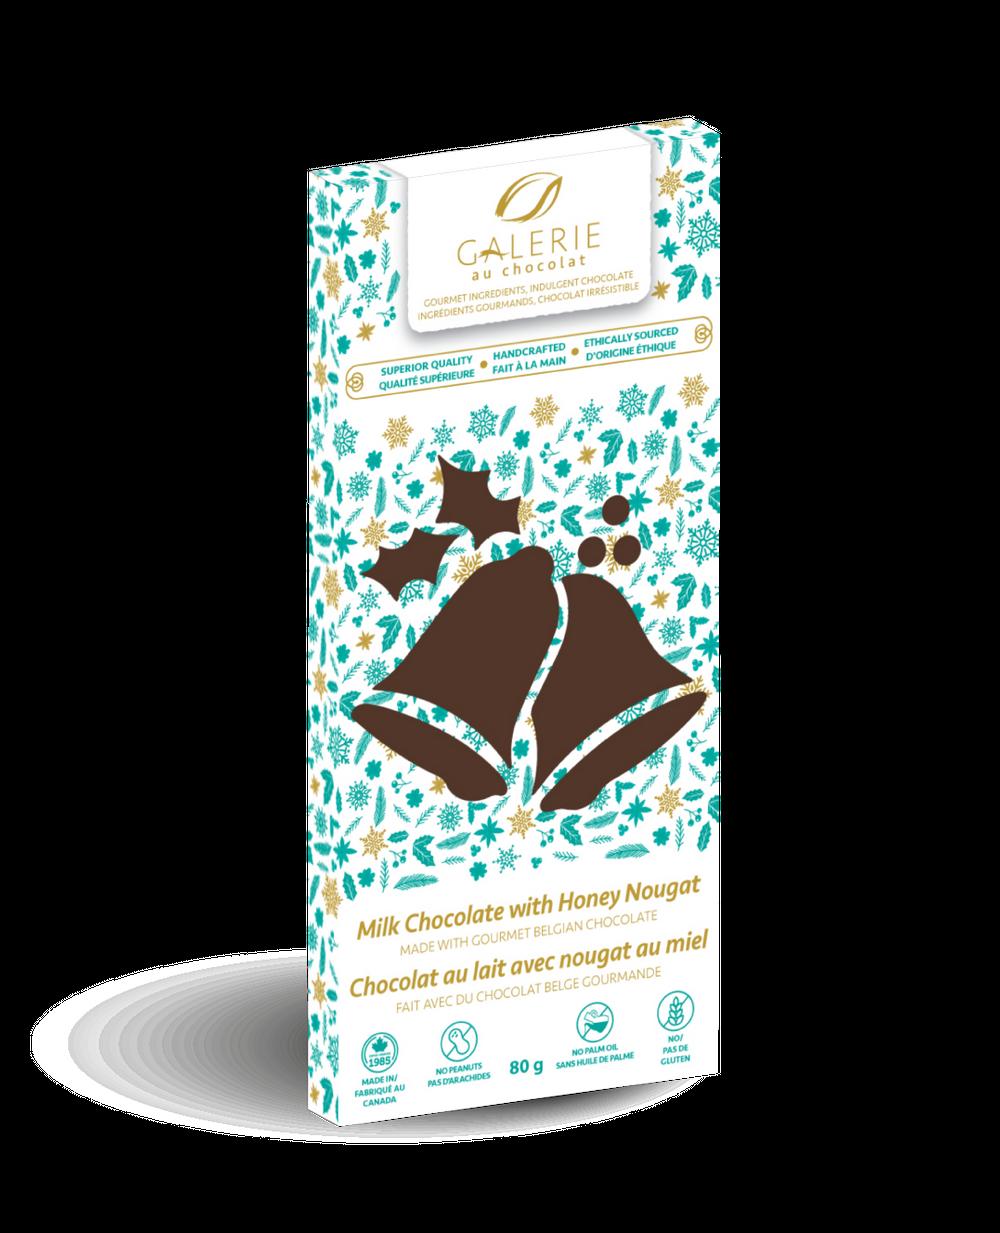 Holiday Milk Chocolate with Honey Nougat Bar